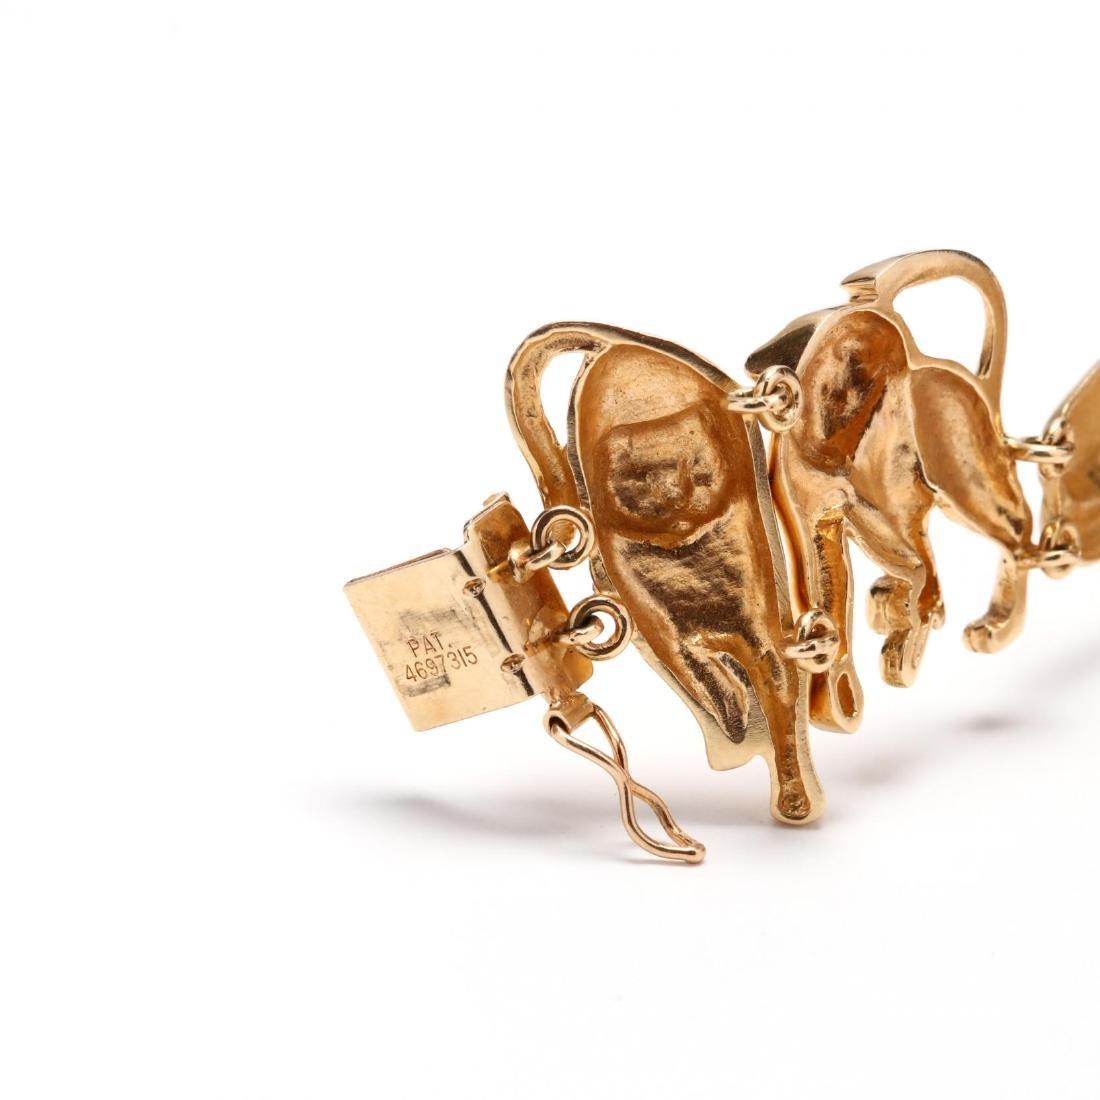 14KT Gold Feline Motif Bracelet, Ardian - 5